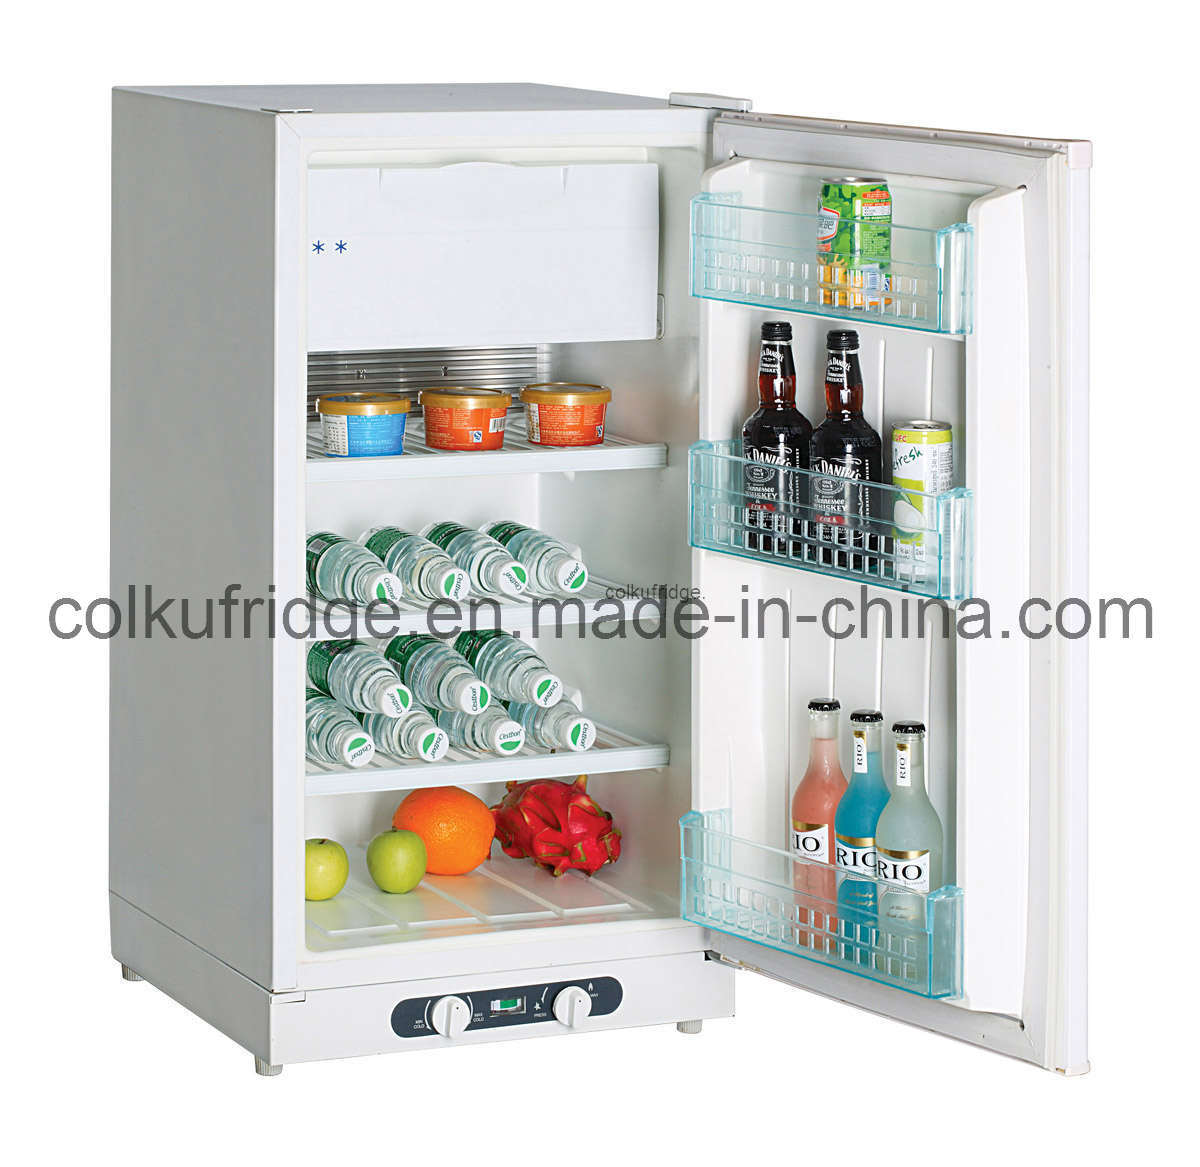 china gas refrigerator 110lt gas fridge xc 110gas. Black Bedroom Furniture Sets. Home Design Ideas